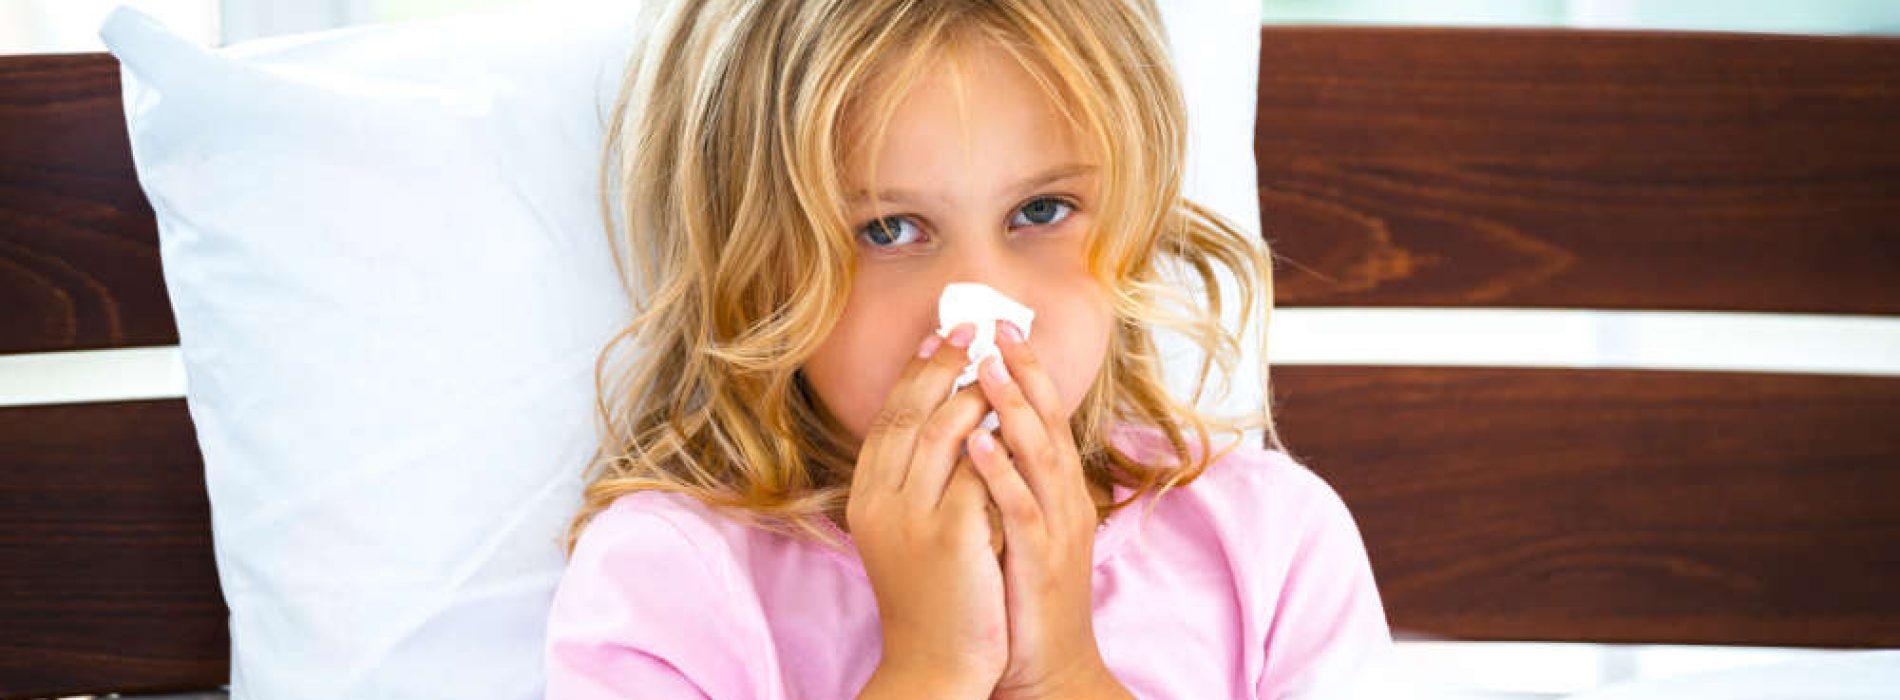 Zo maak je je slaapkamer allergie proof